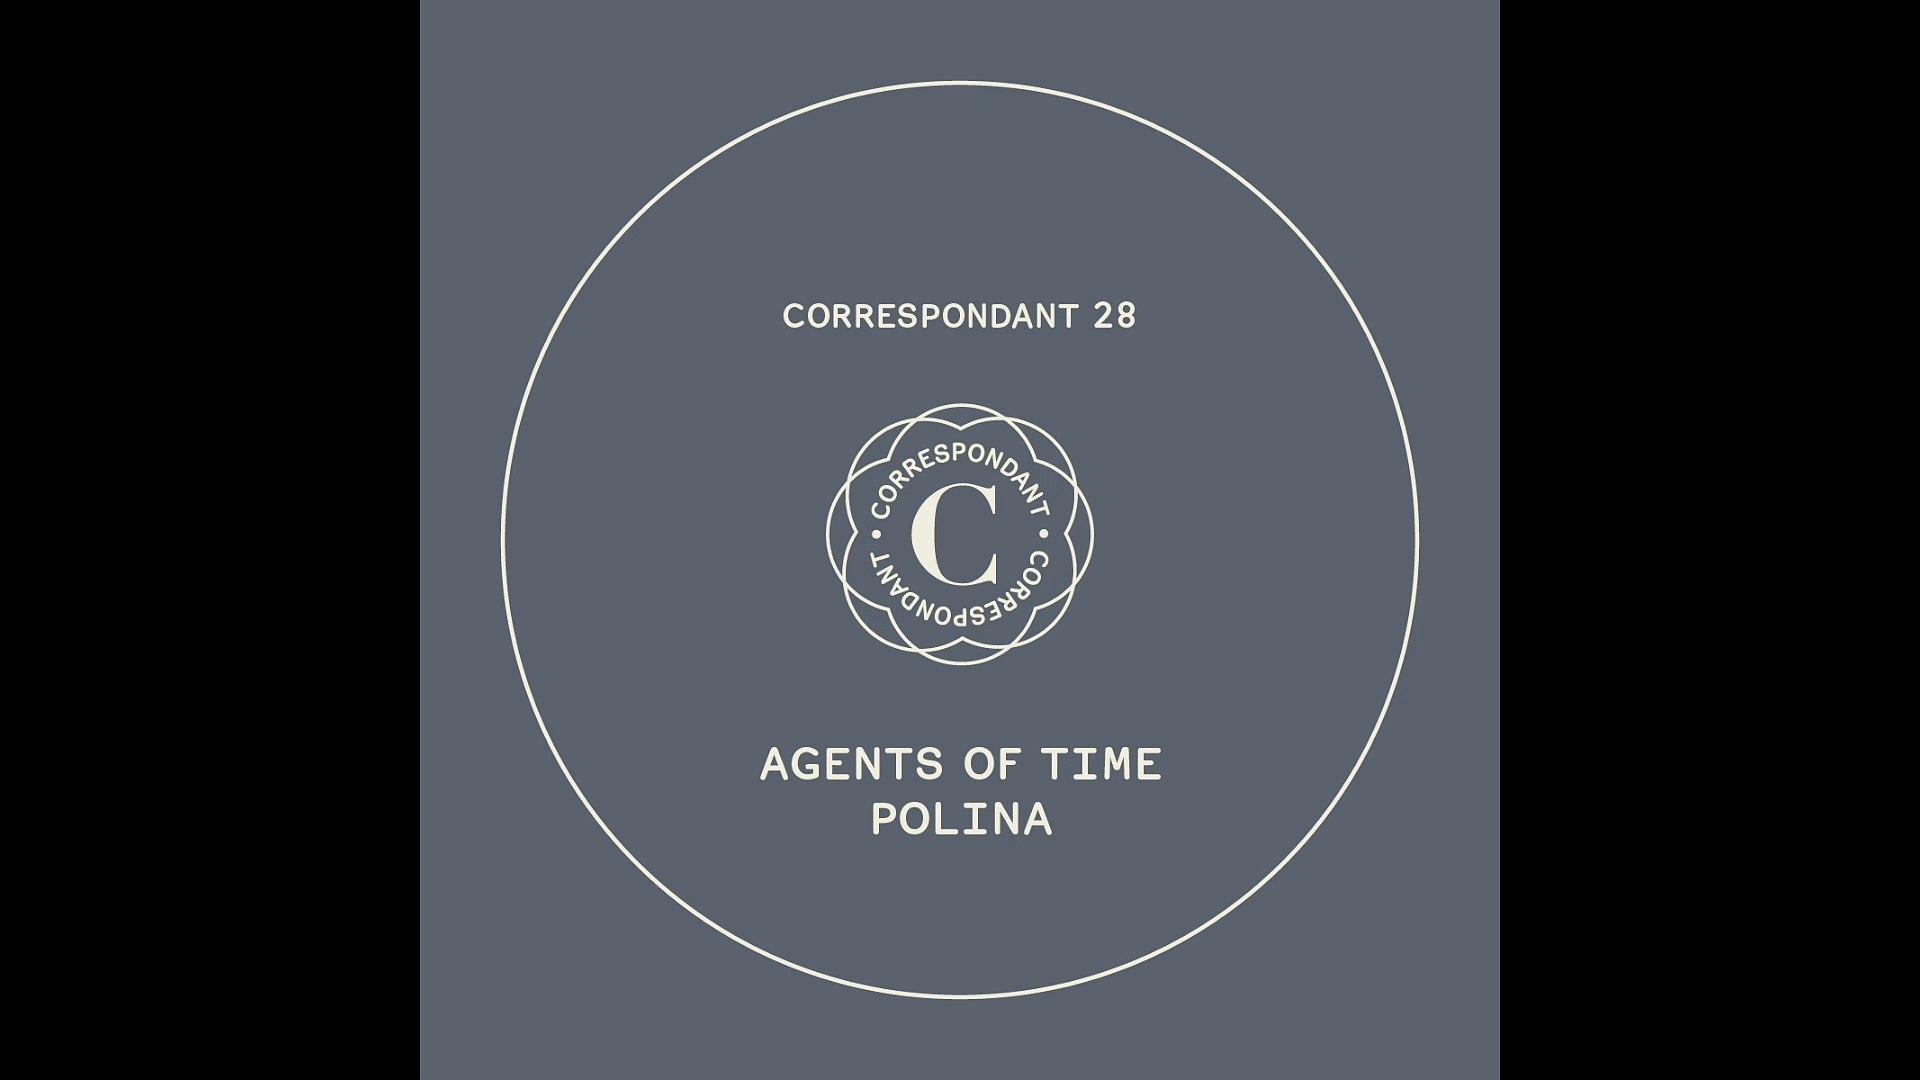 AGENTS OF TIME - Polina (Alex Smoke Remix) - CORRESPONDANT #28